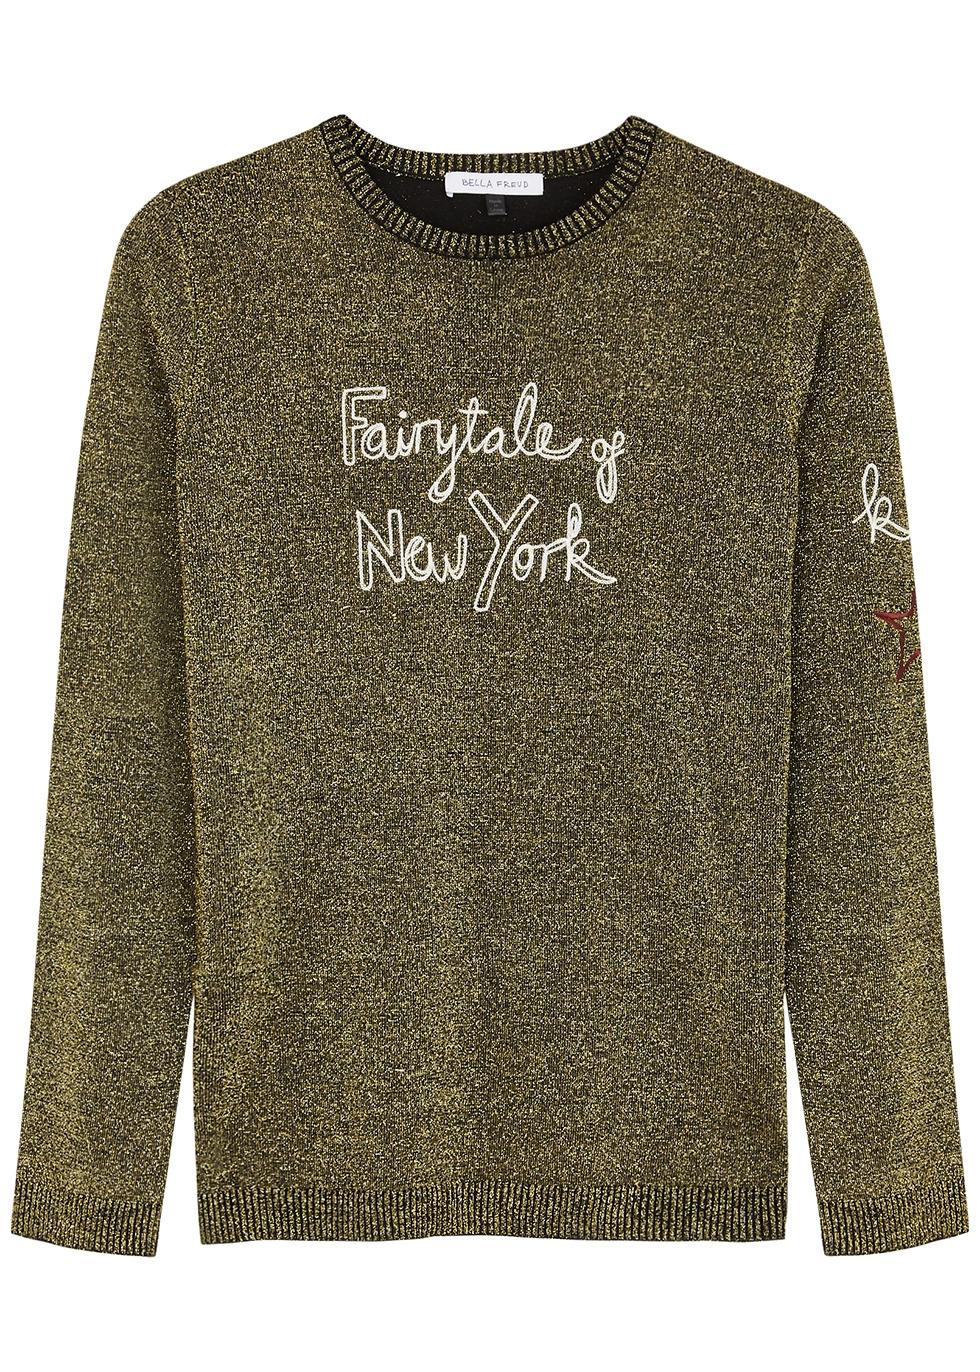 Fairytale Of New York metallic-knit jumper